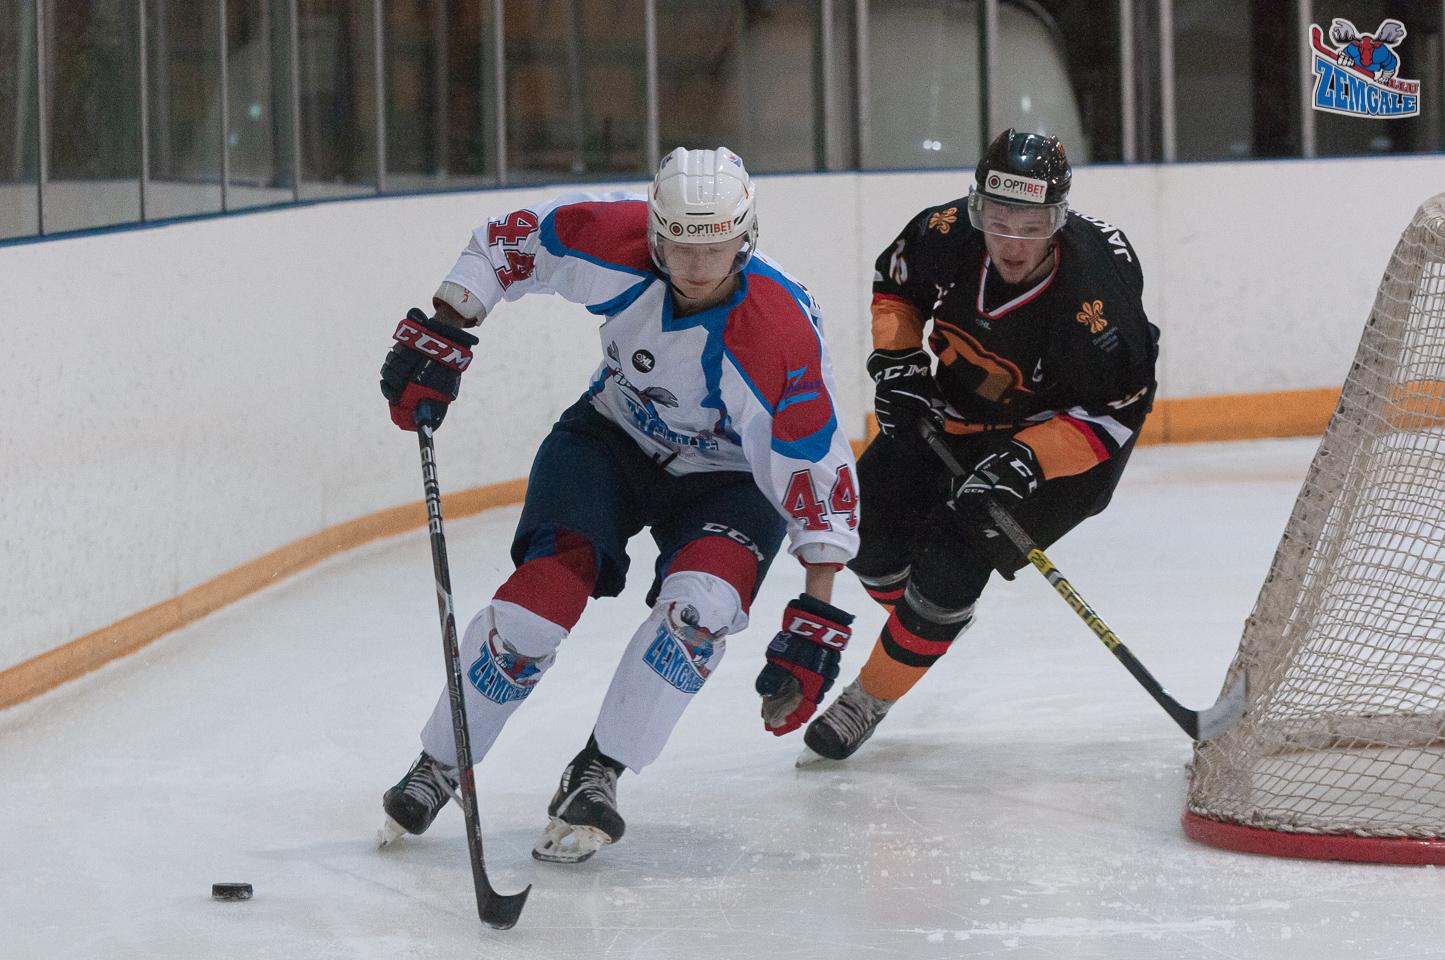 Hokejisti slido ar ripu aiz vārtiem